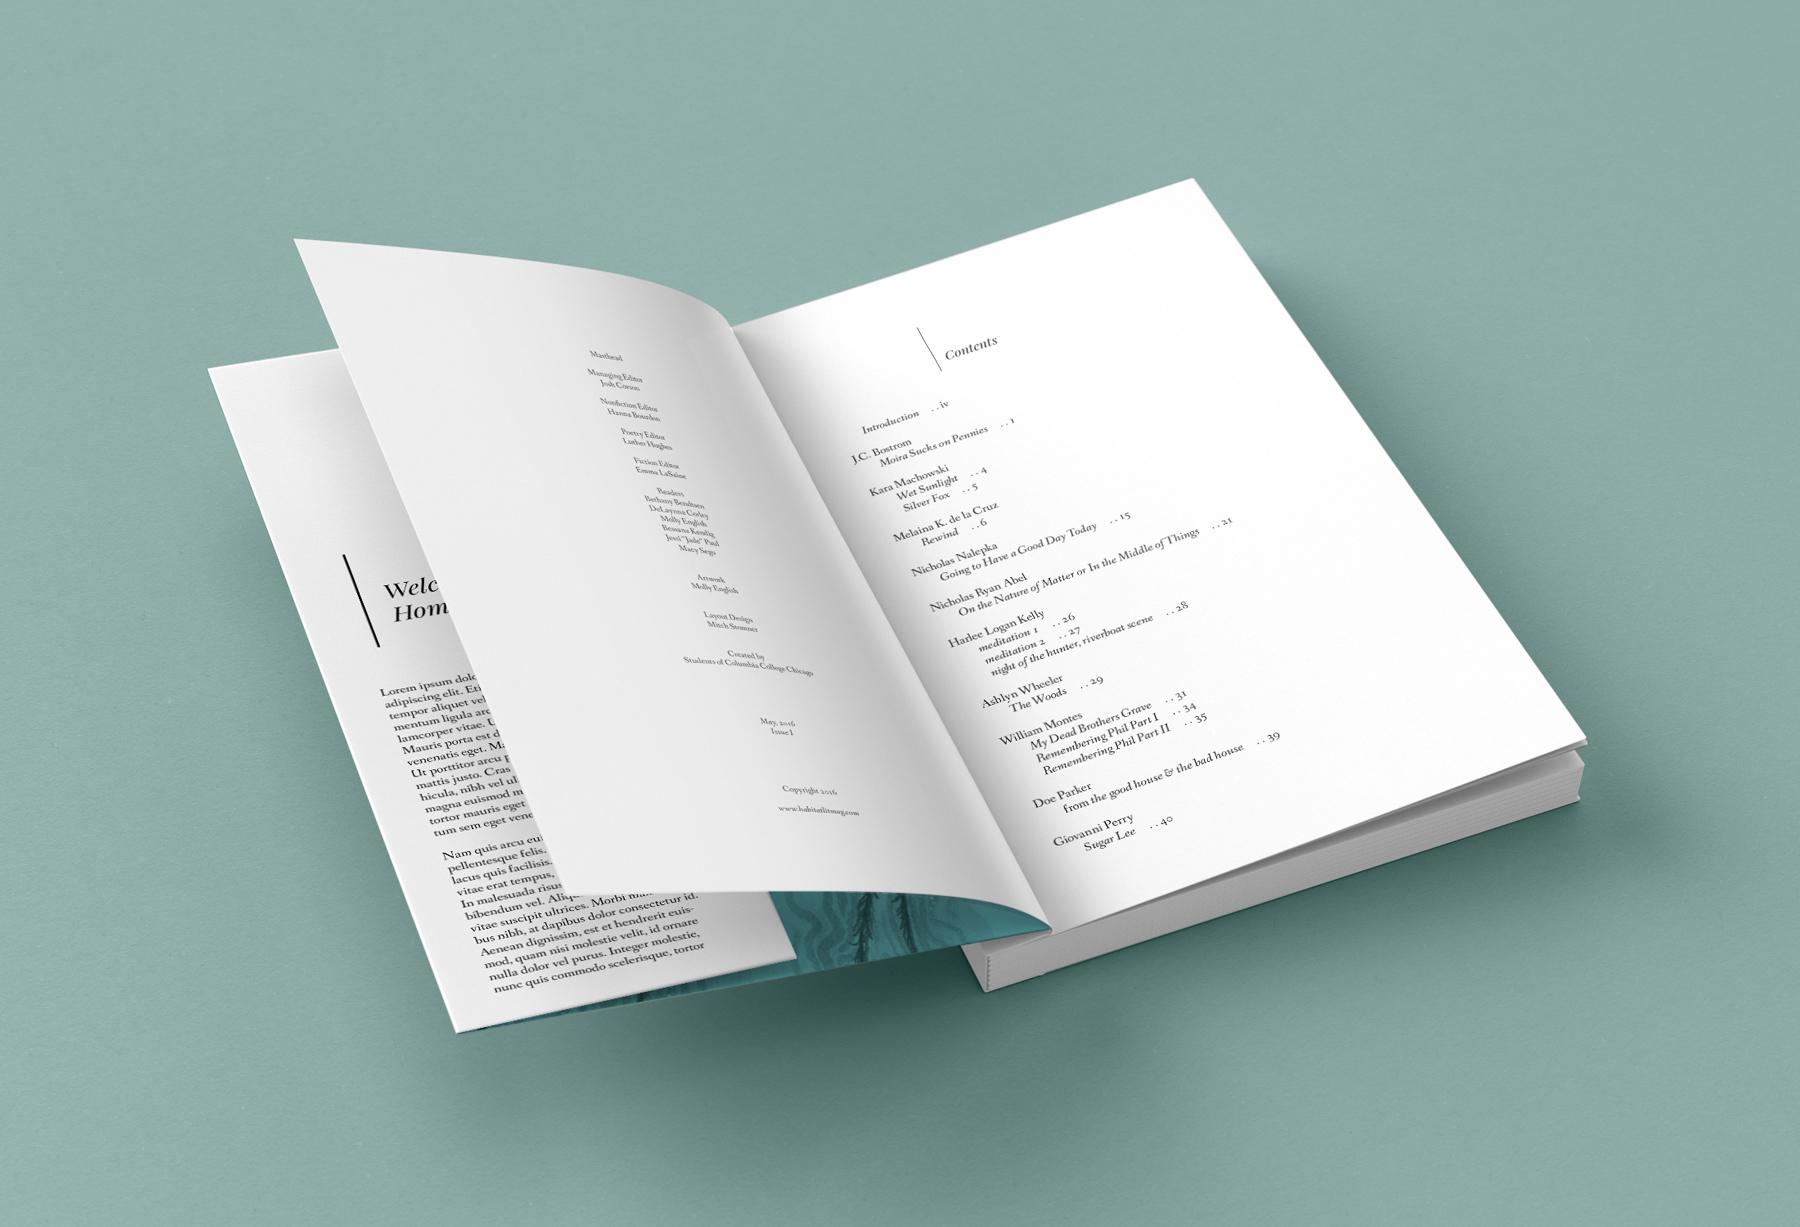 HABITAT-MAG_Book_Mockup_4.jpg